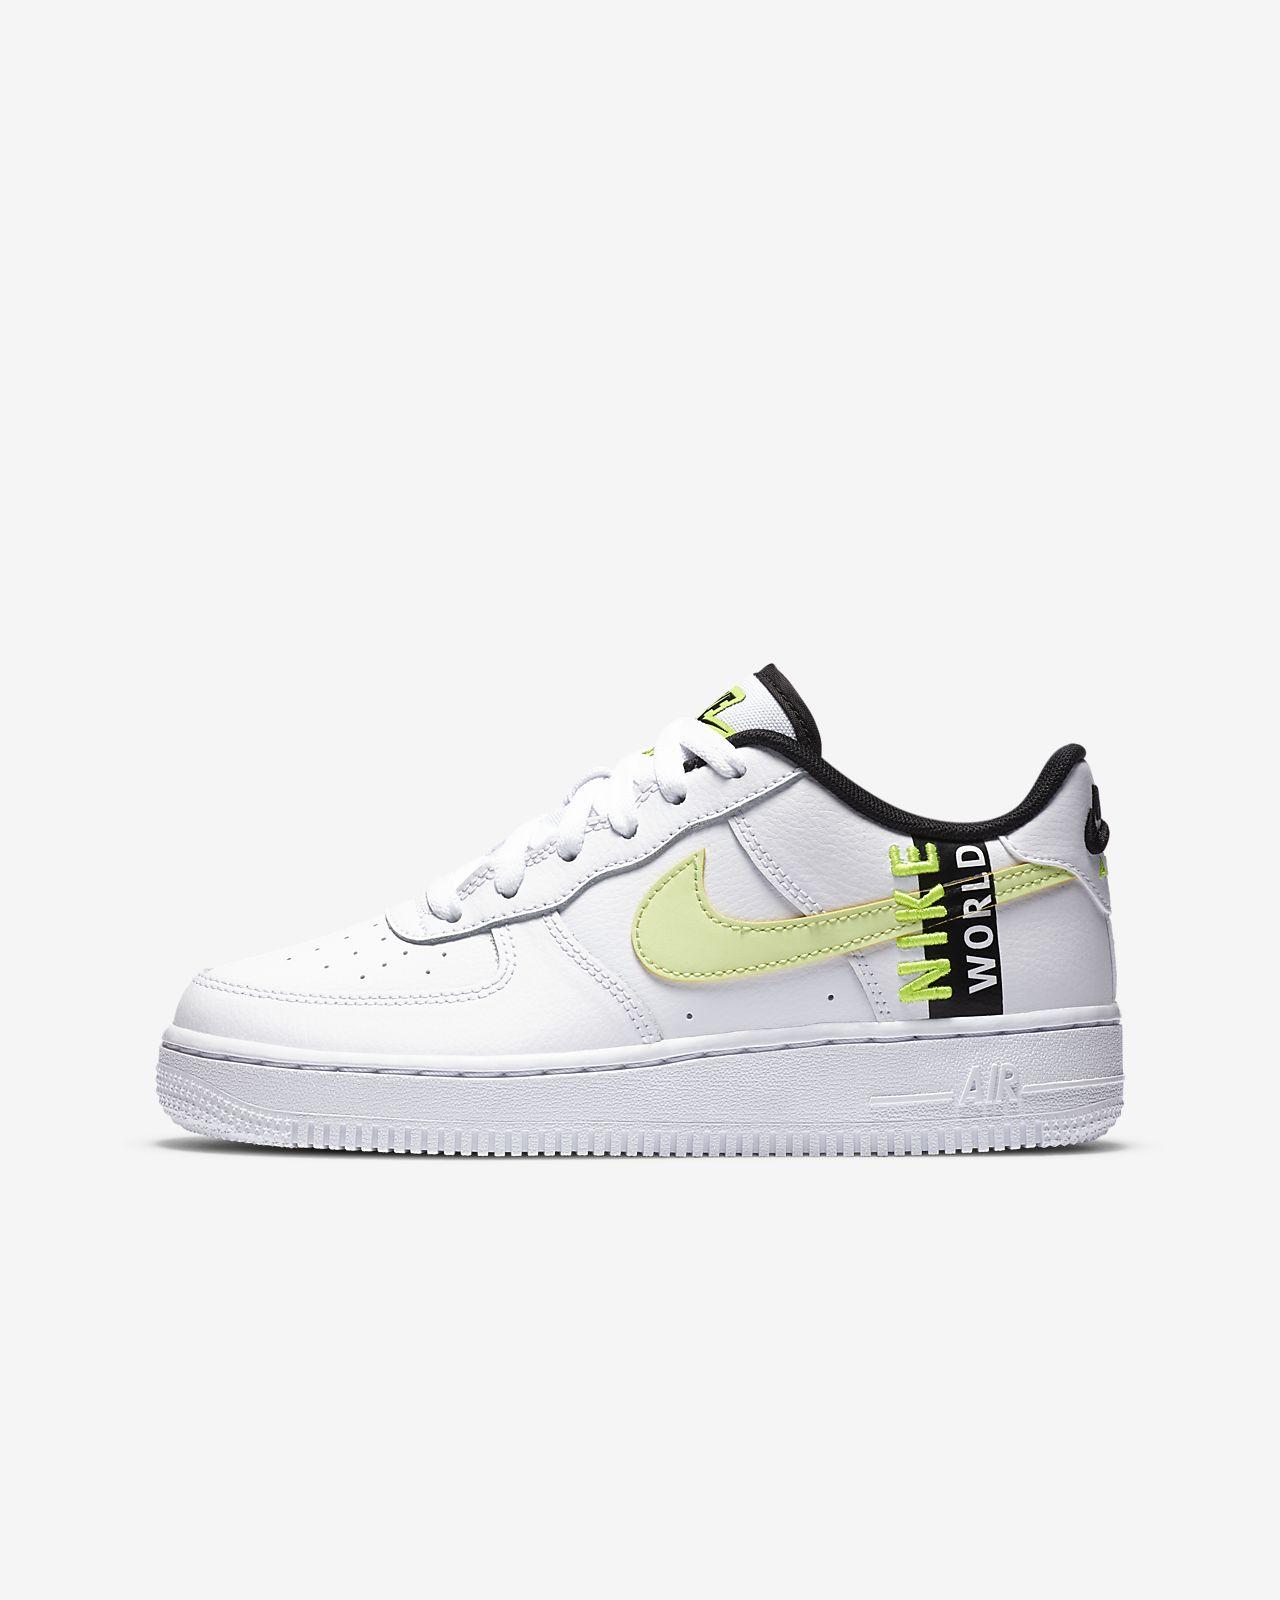 Buty dla dużych dzieci Nike Air Force 1 LV8 1